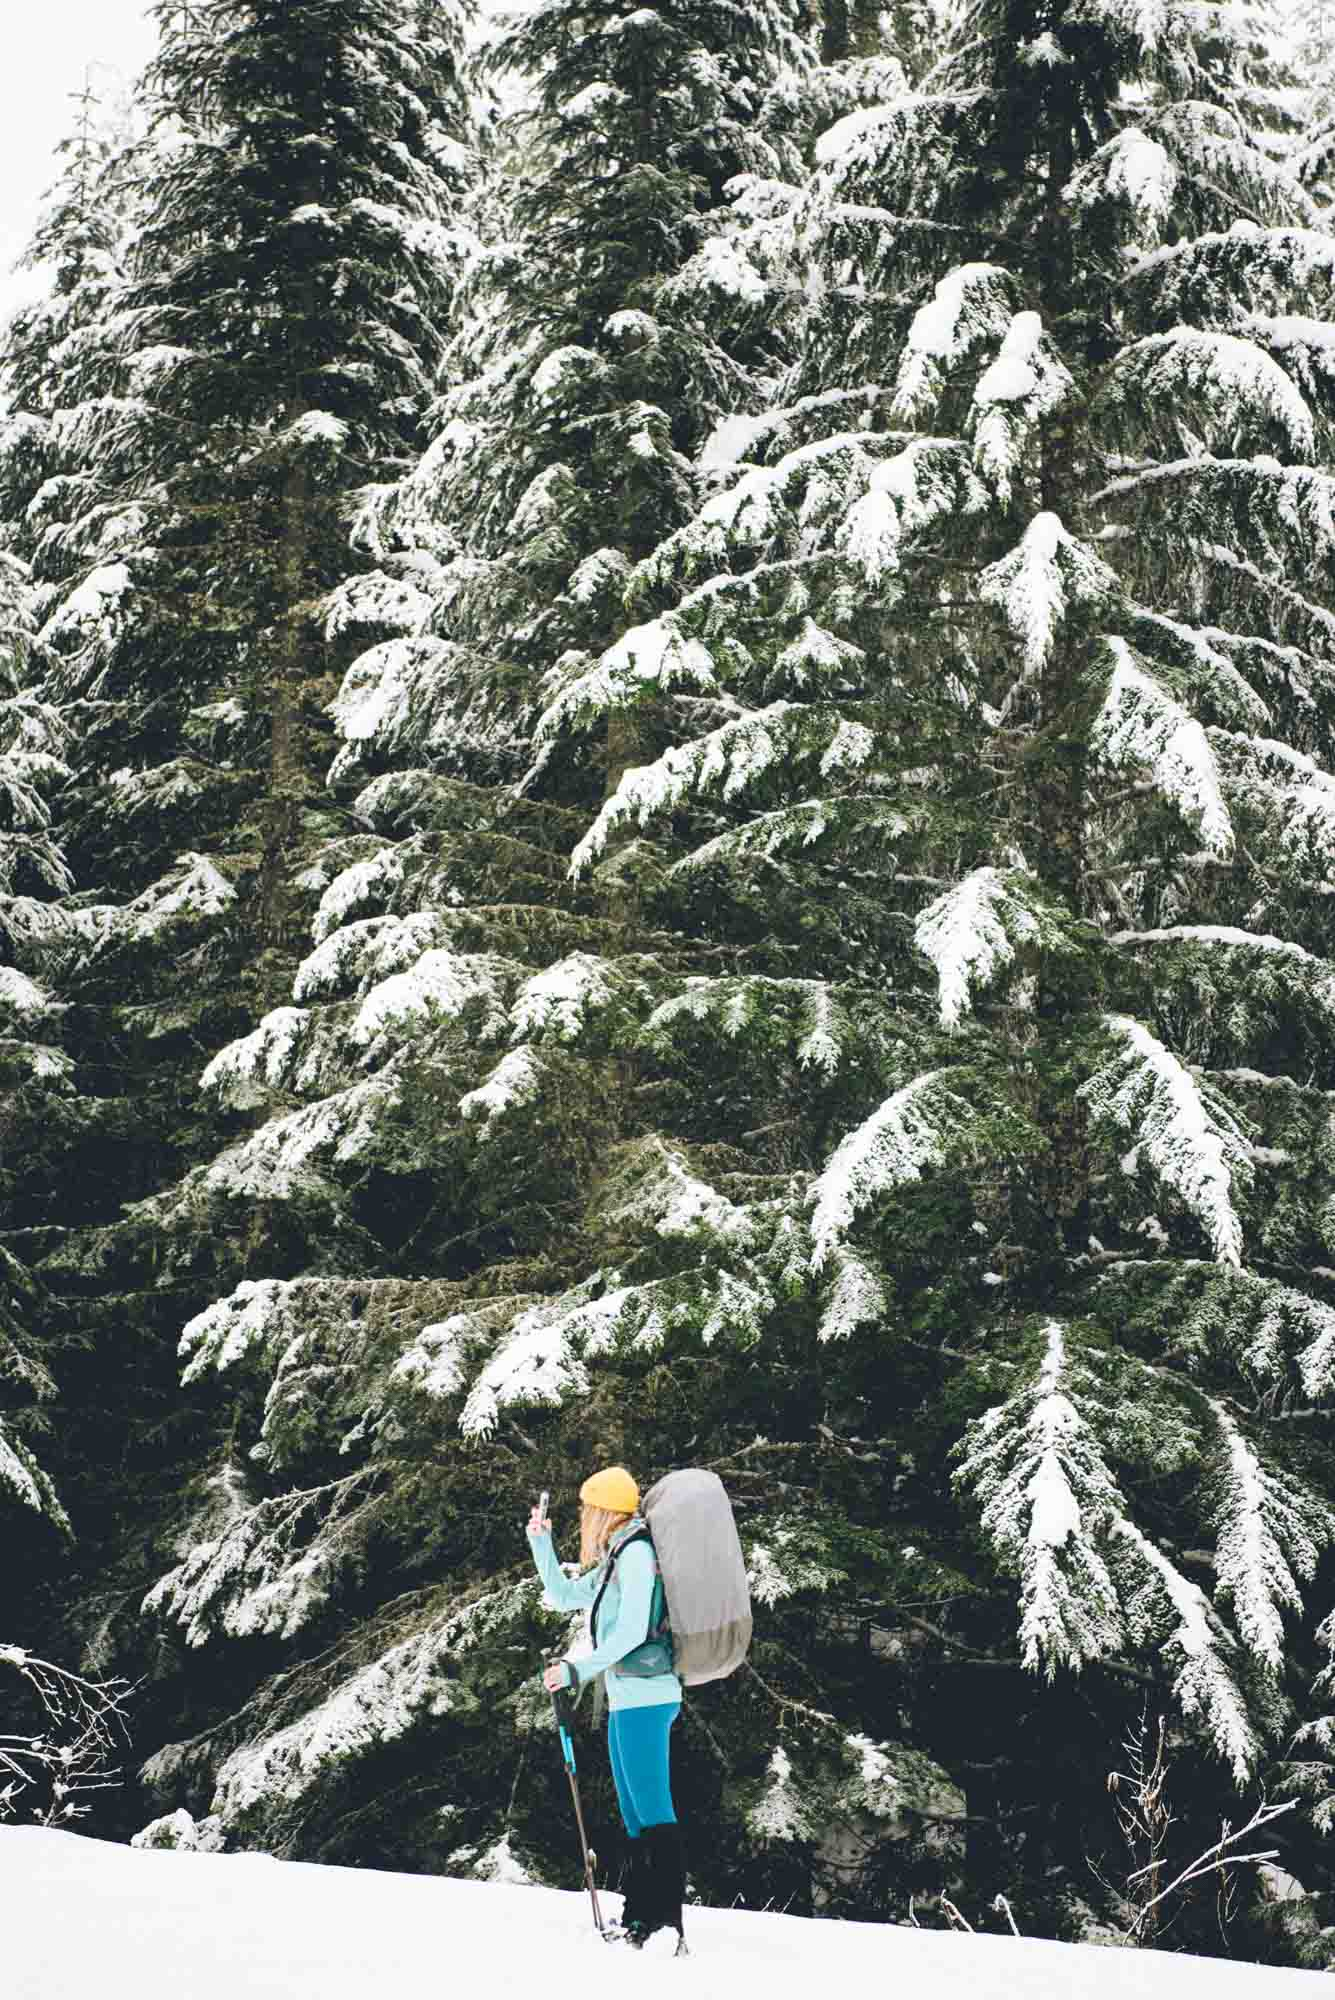 Miriam-Subbiah-Snow-Bowl-Hut-5.jpg